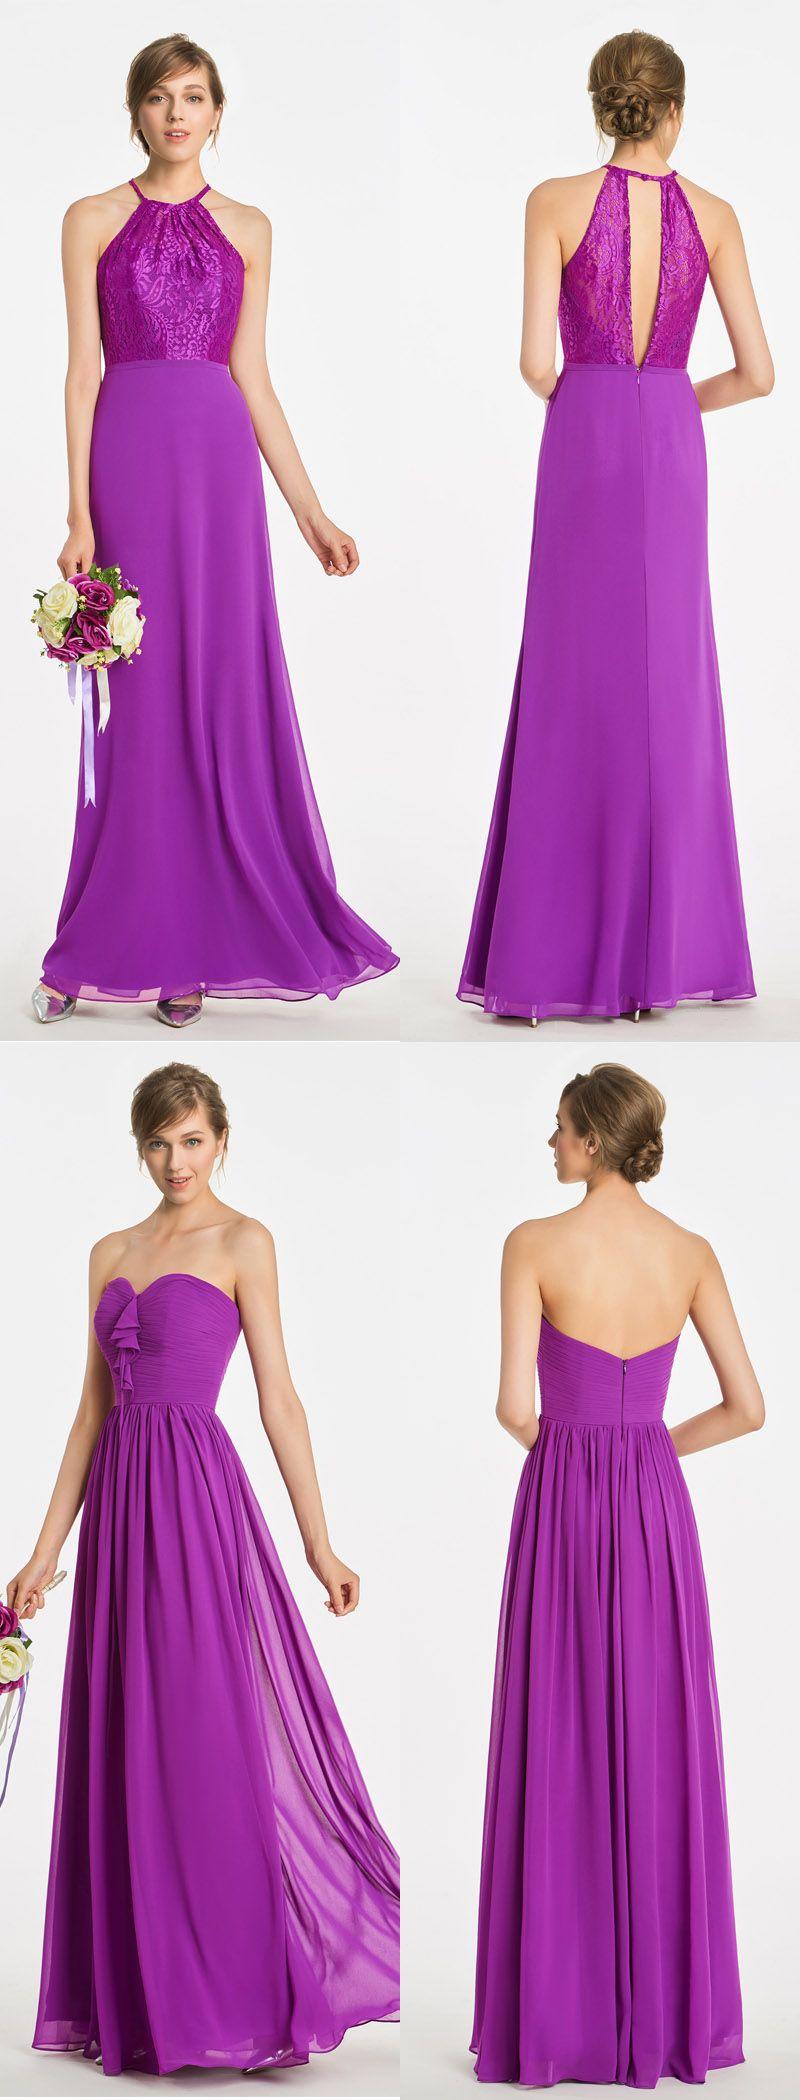 Purple bridesmaid dress wedding bridesmaid Bridesmaid